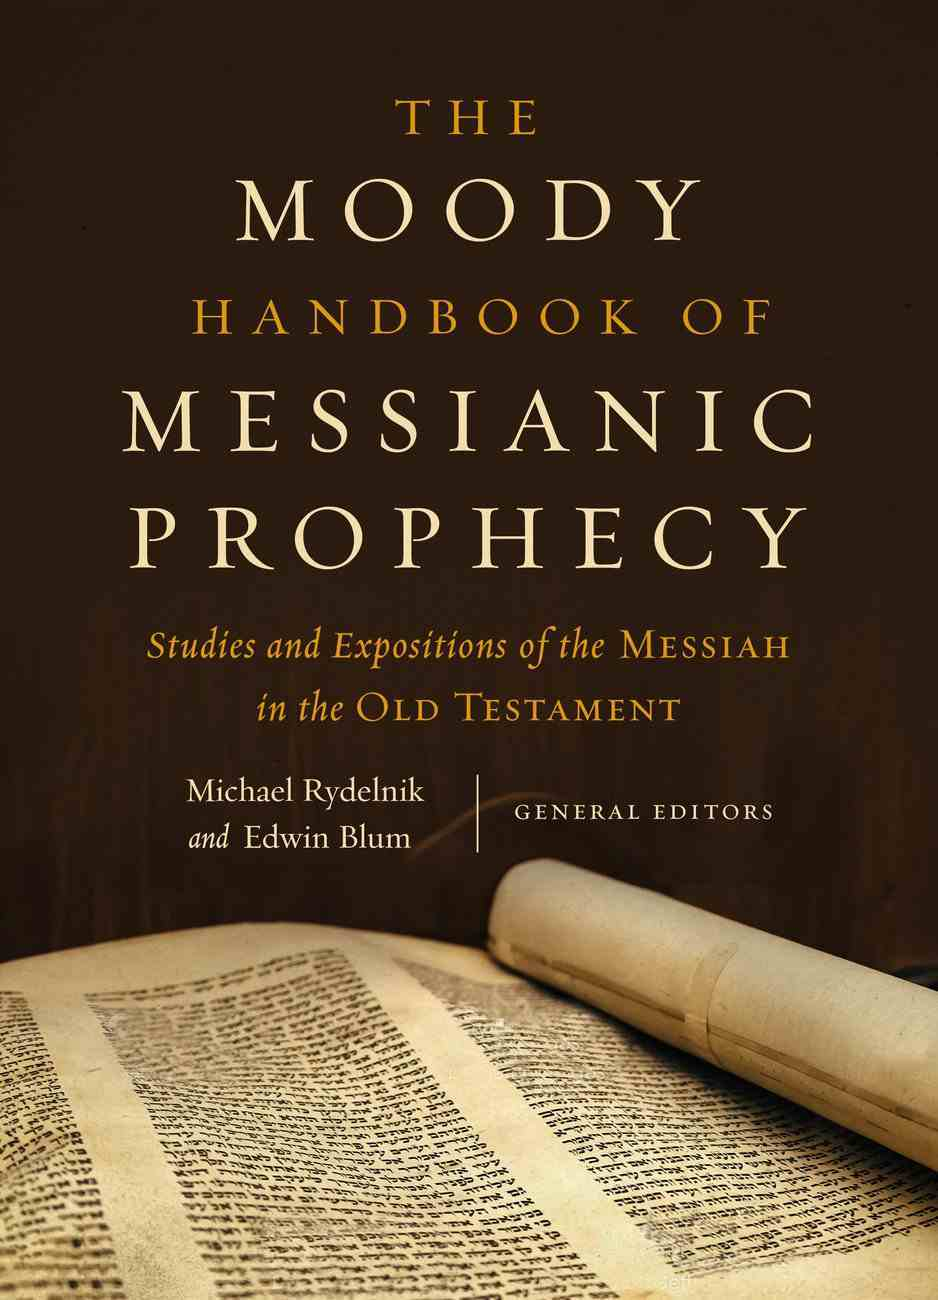 The Moody Handbook of Messianic Prophecy eBook